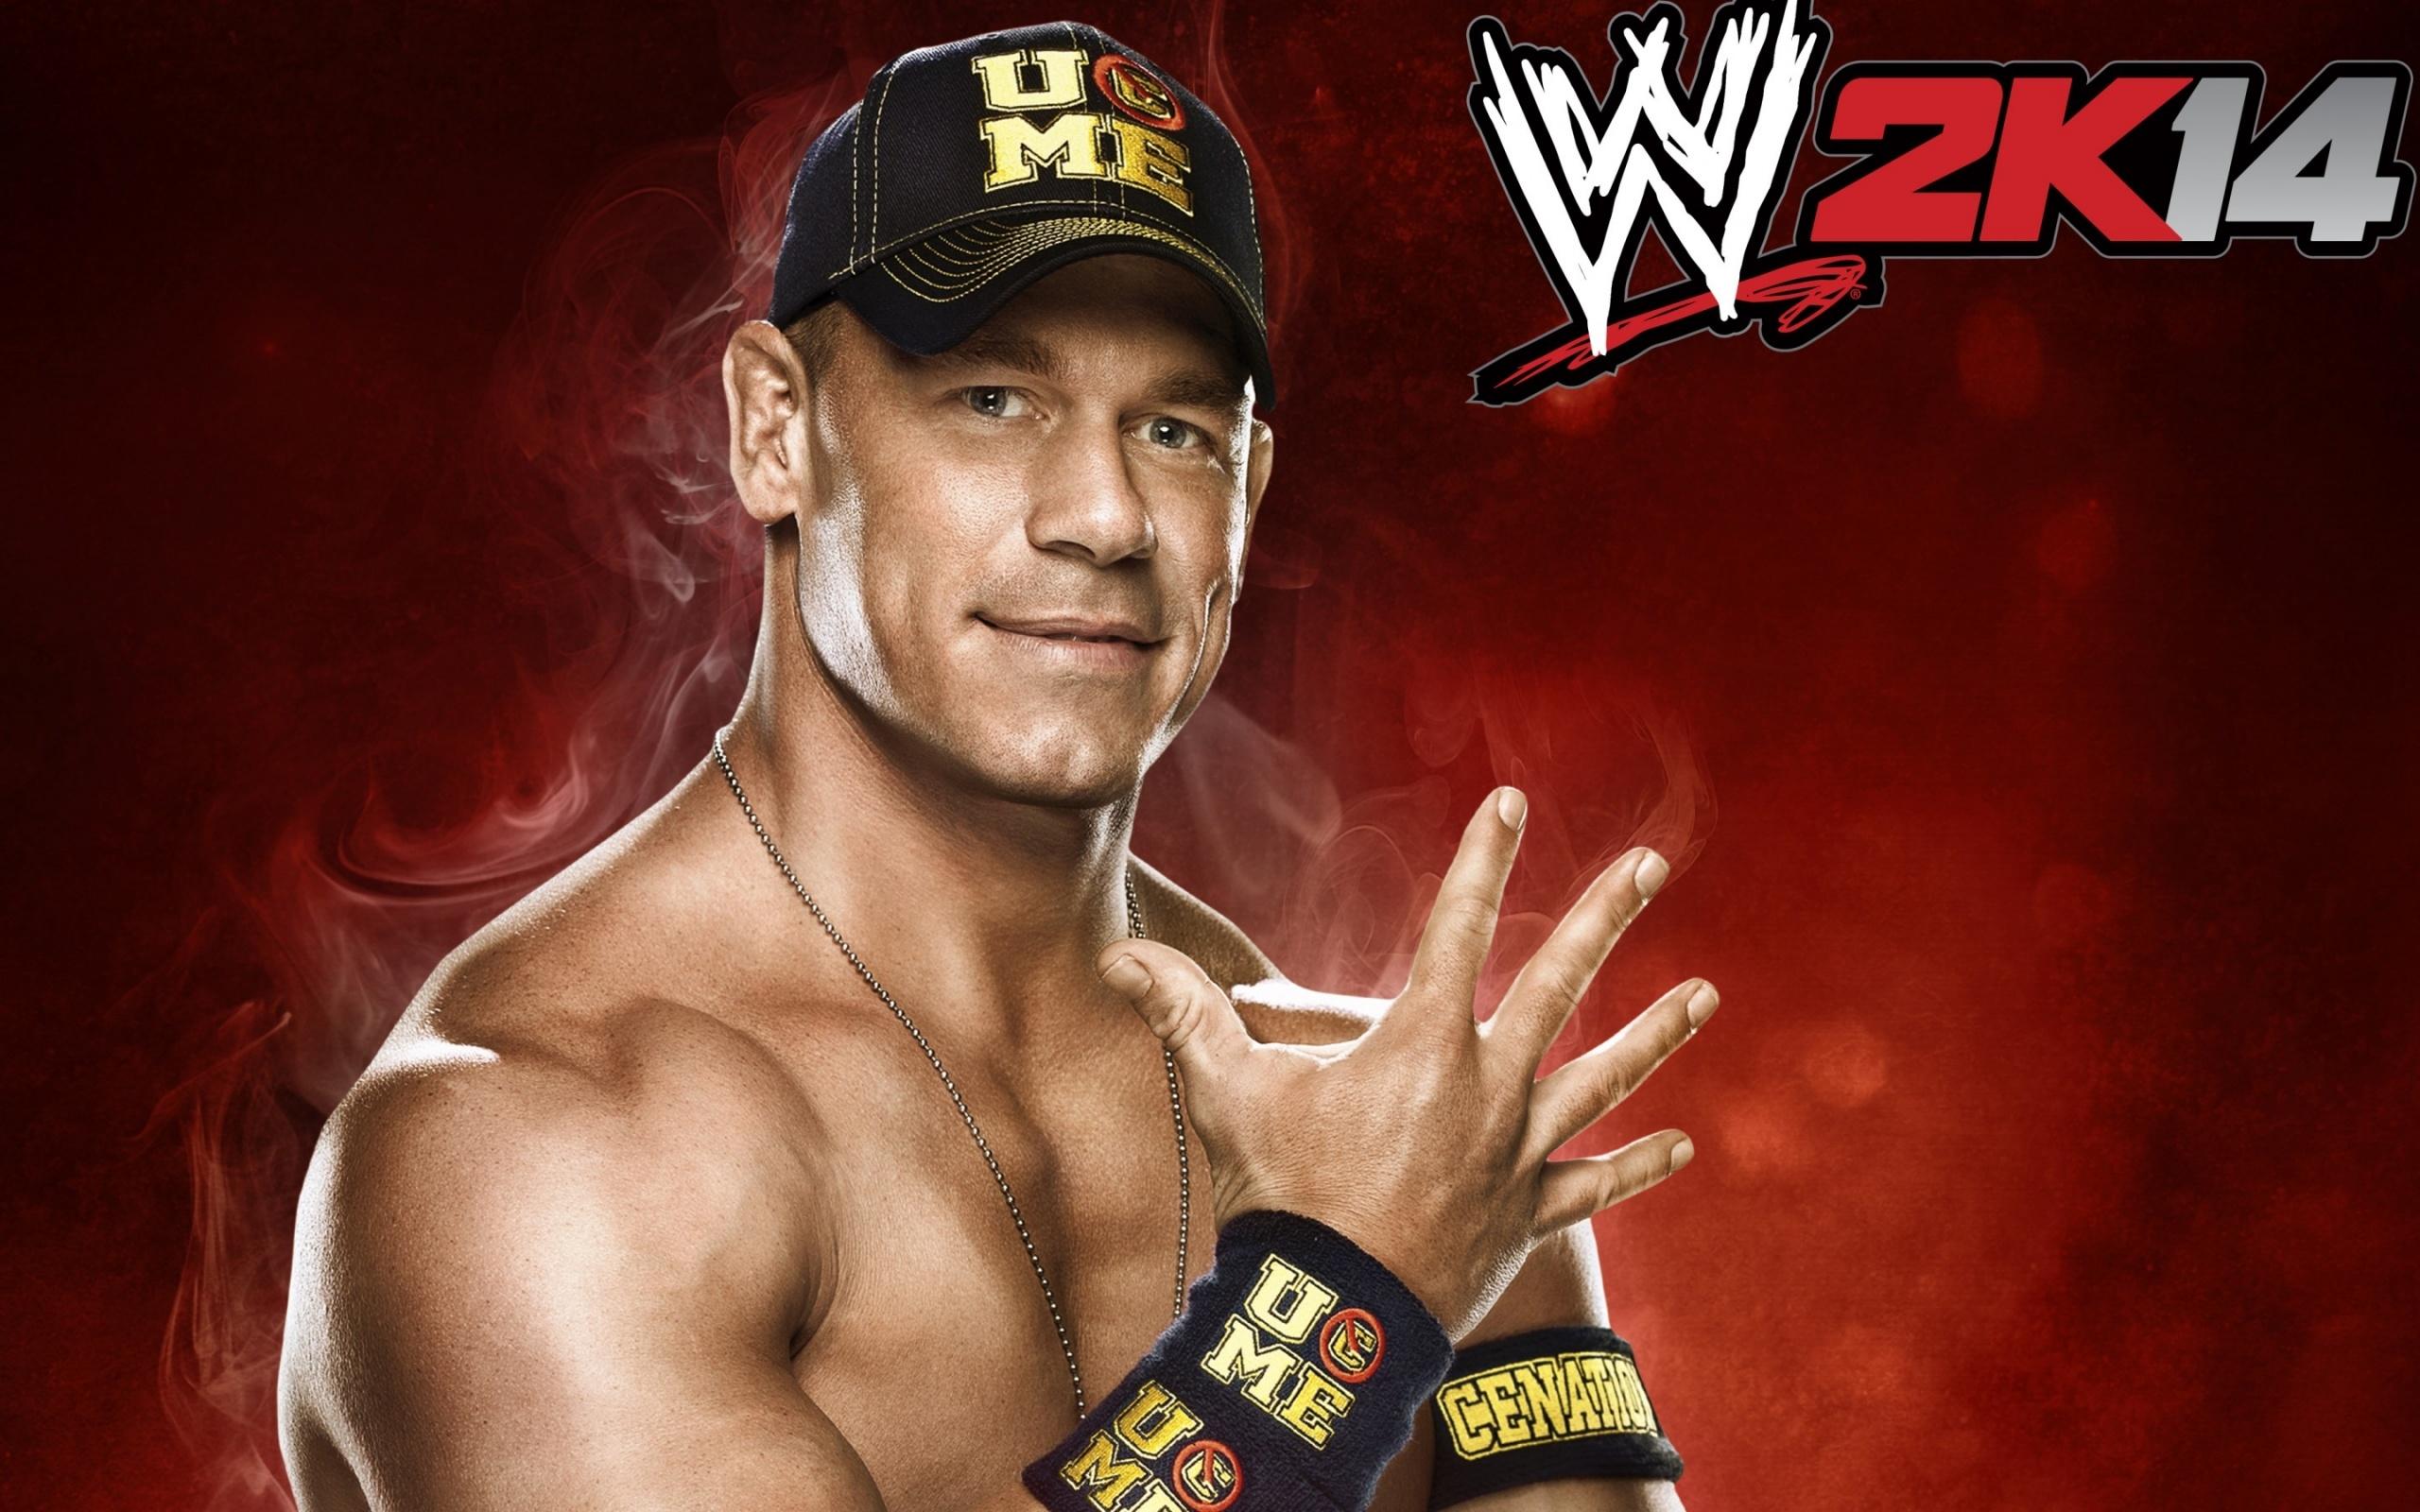 John Cena Wallpapers Free Download